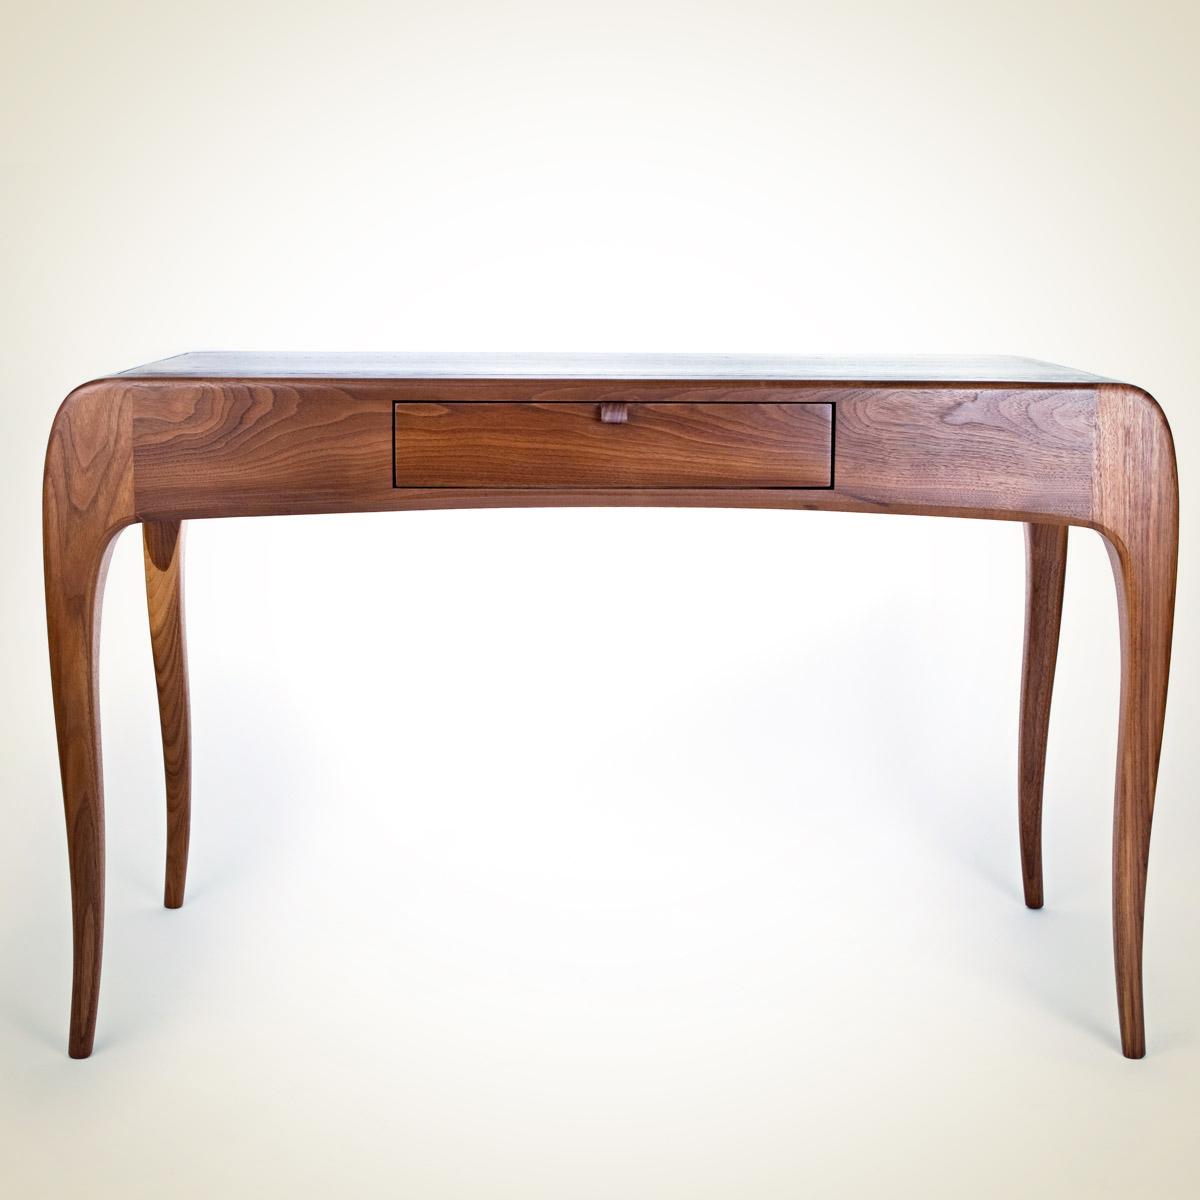 Caleb-Woodard-Hayworth-Desk_2.jpg